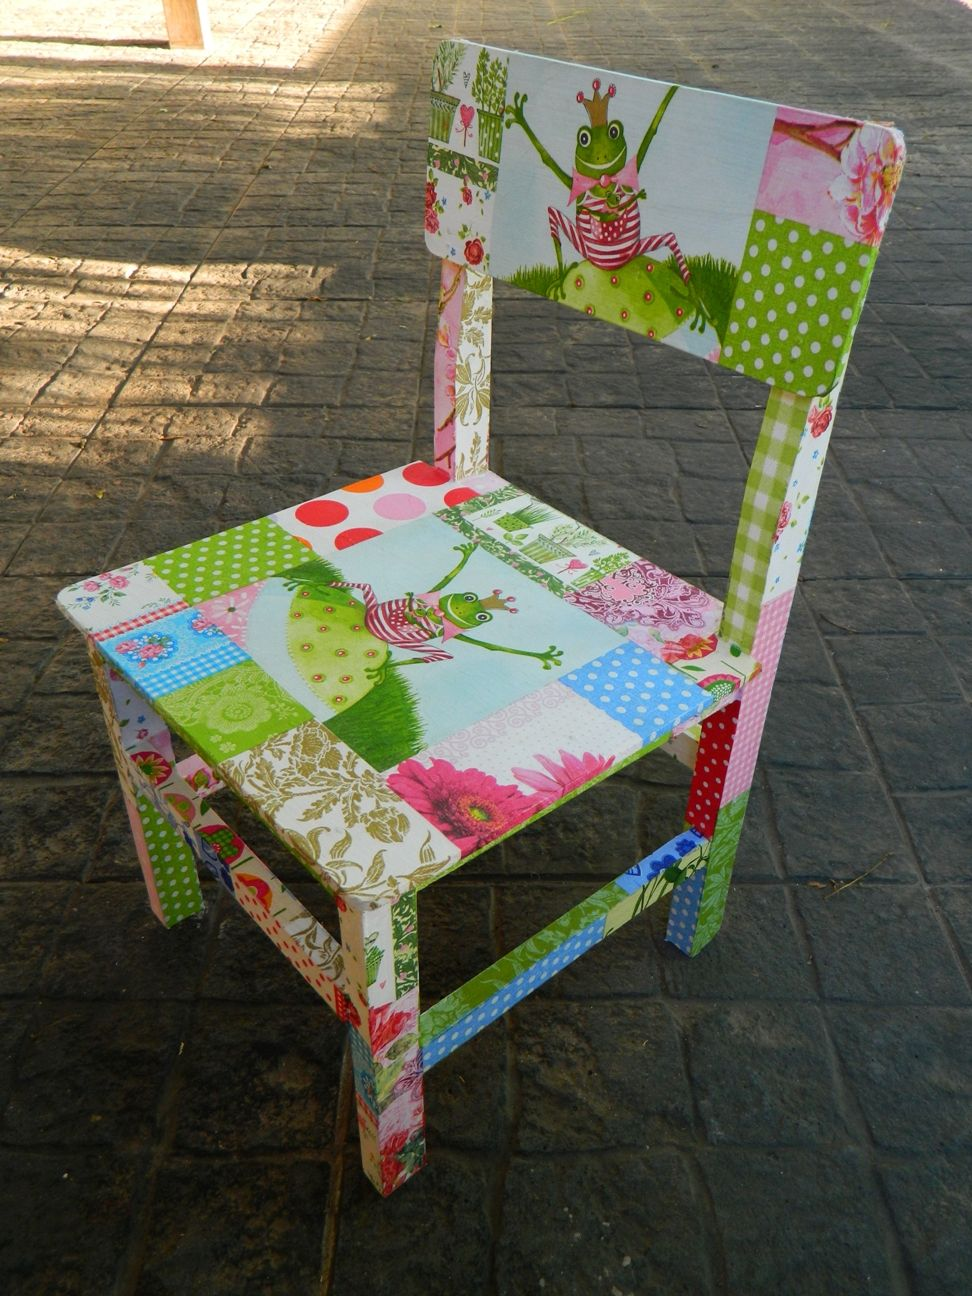 Pin de fernanda aguilar en decoracion para casa muebles - Sillas infantiles ...